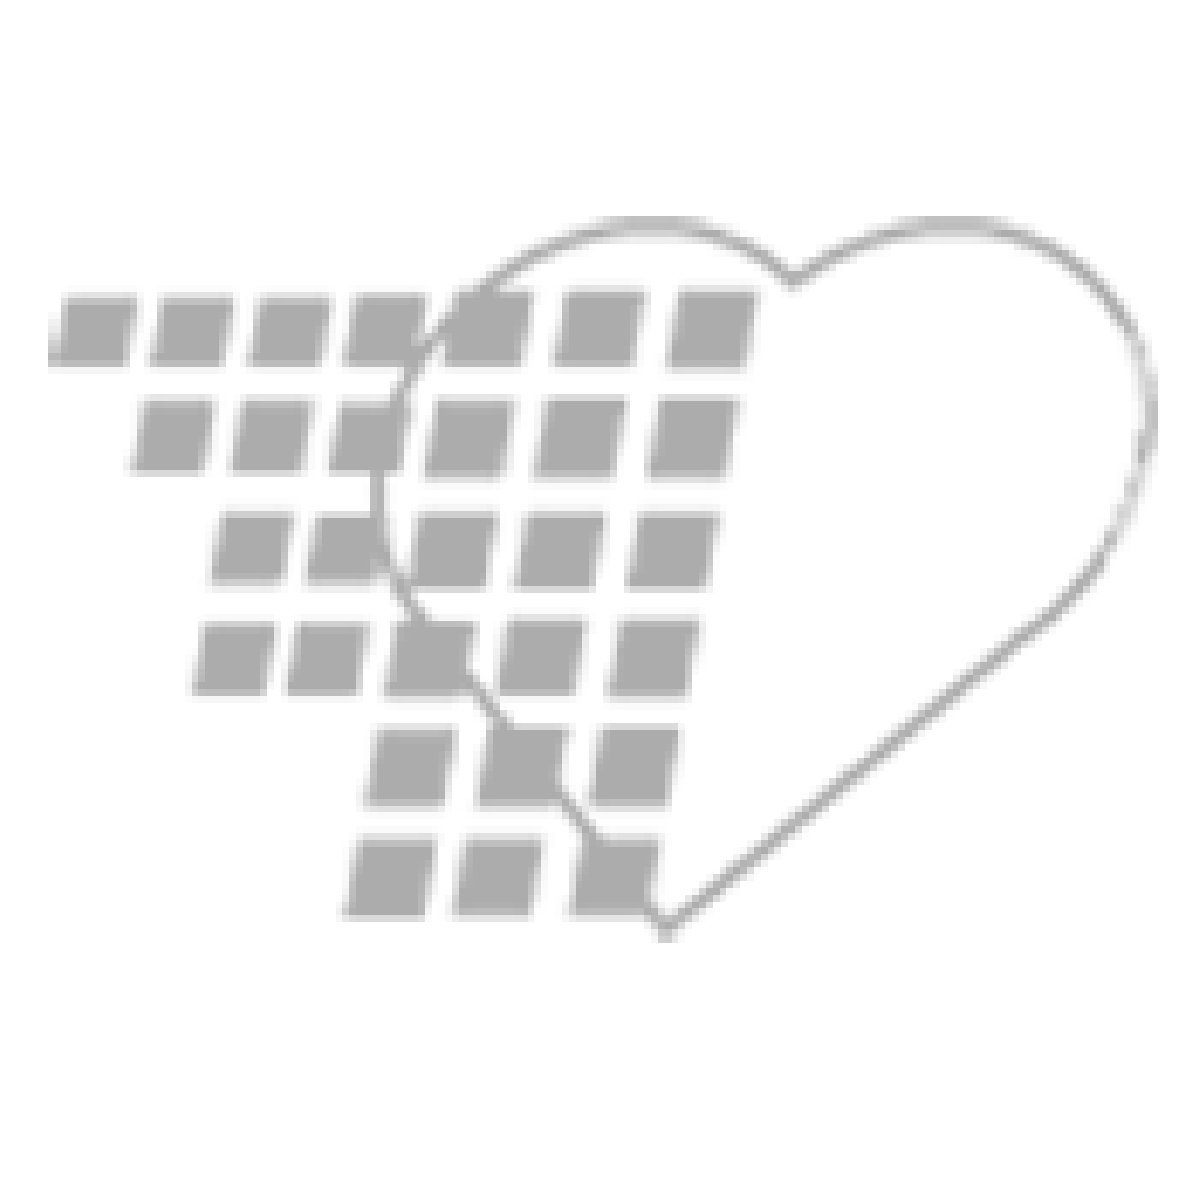 06-18-0302 ChemoPlus™ Prep Mat